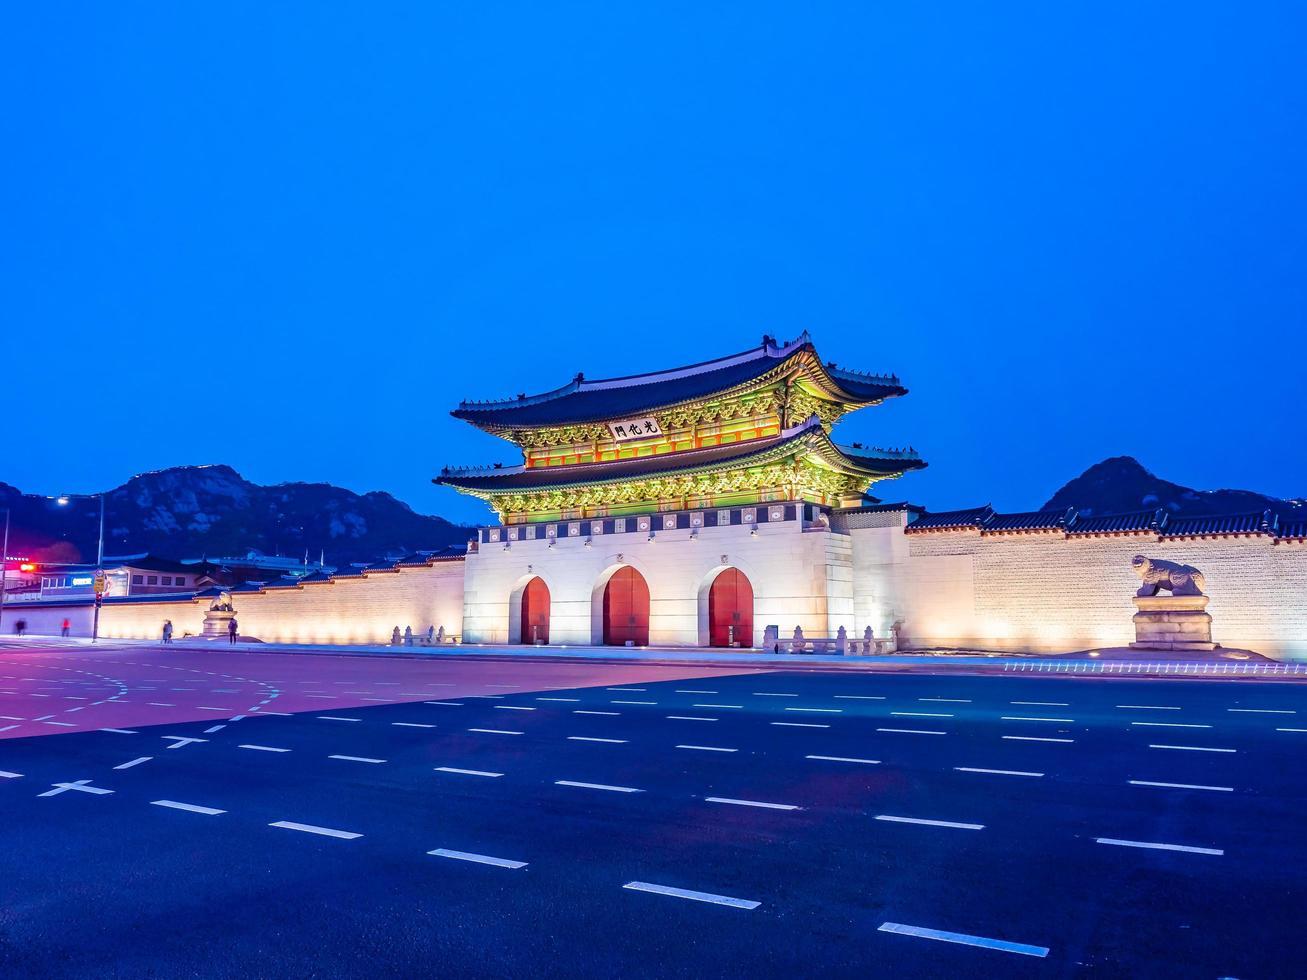 gyeongbokgung-paleis, de stad van seoel in zuid-korea foto